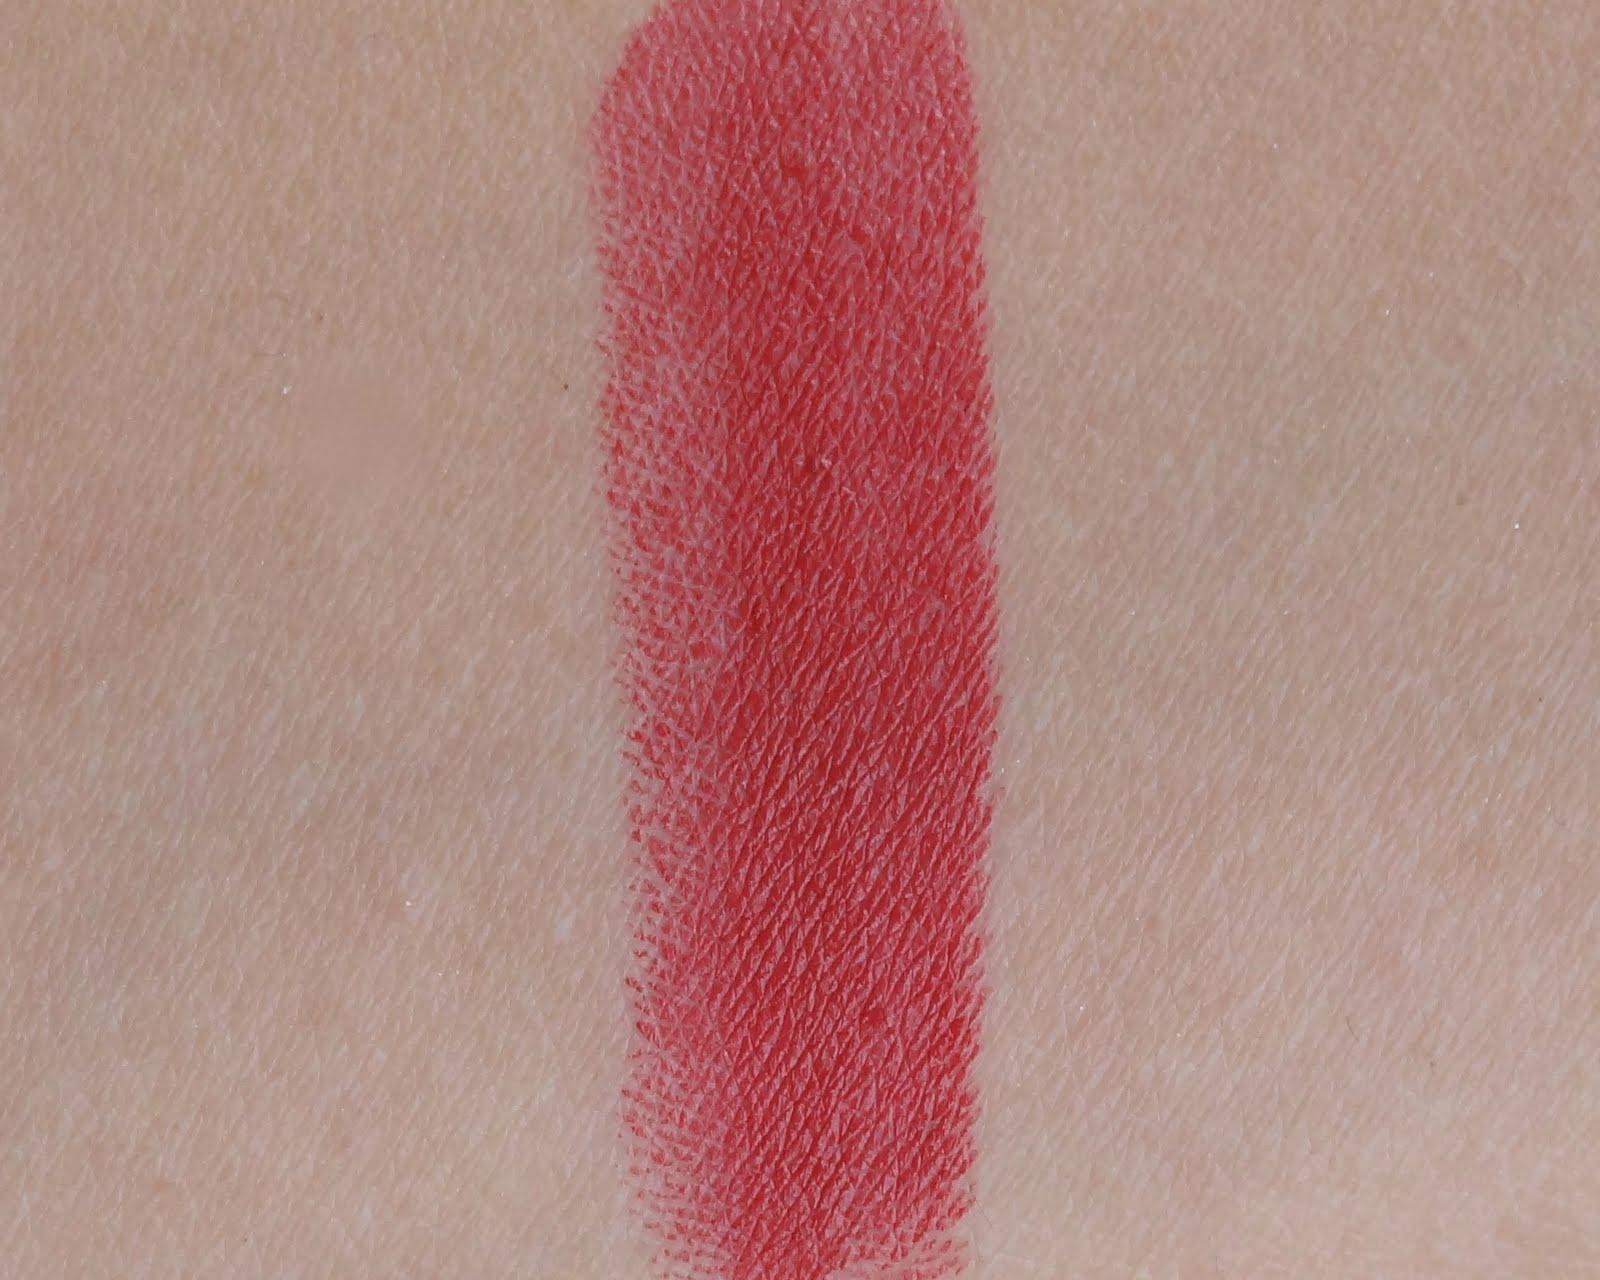 Mac Viva Glam 1 Lipstick :Swatch, Review, Photos ...